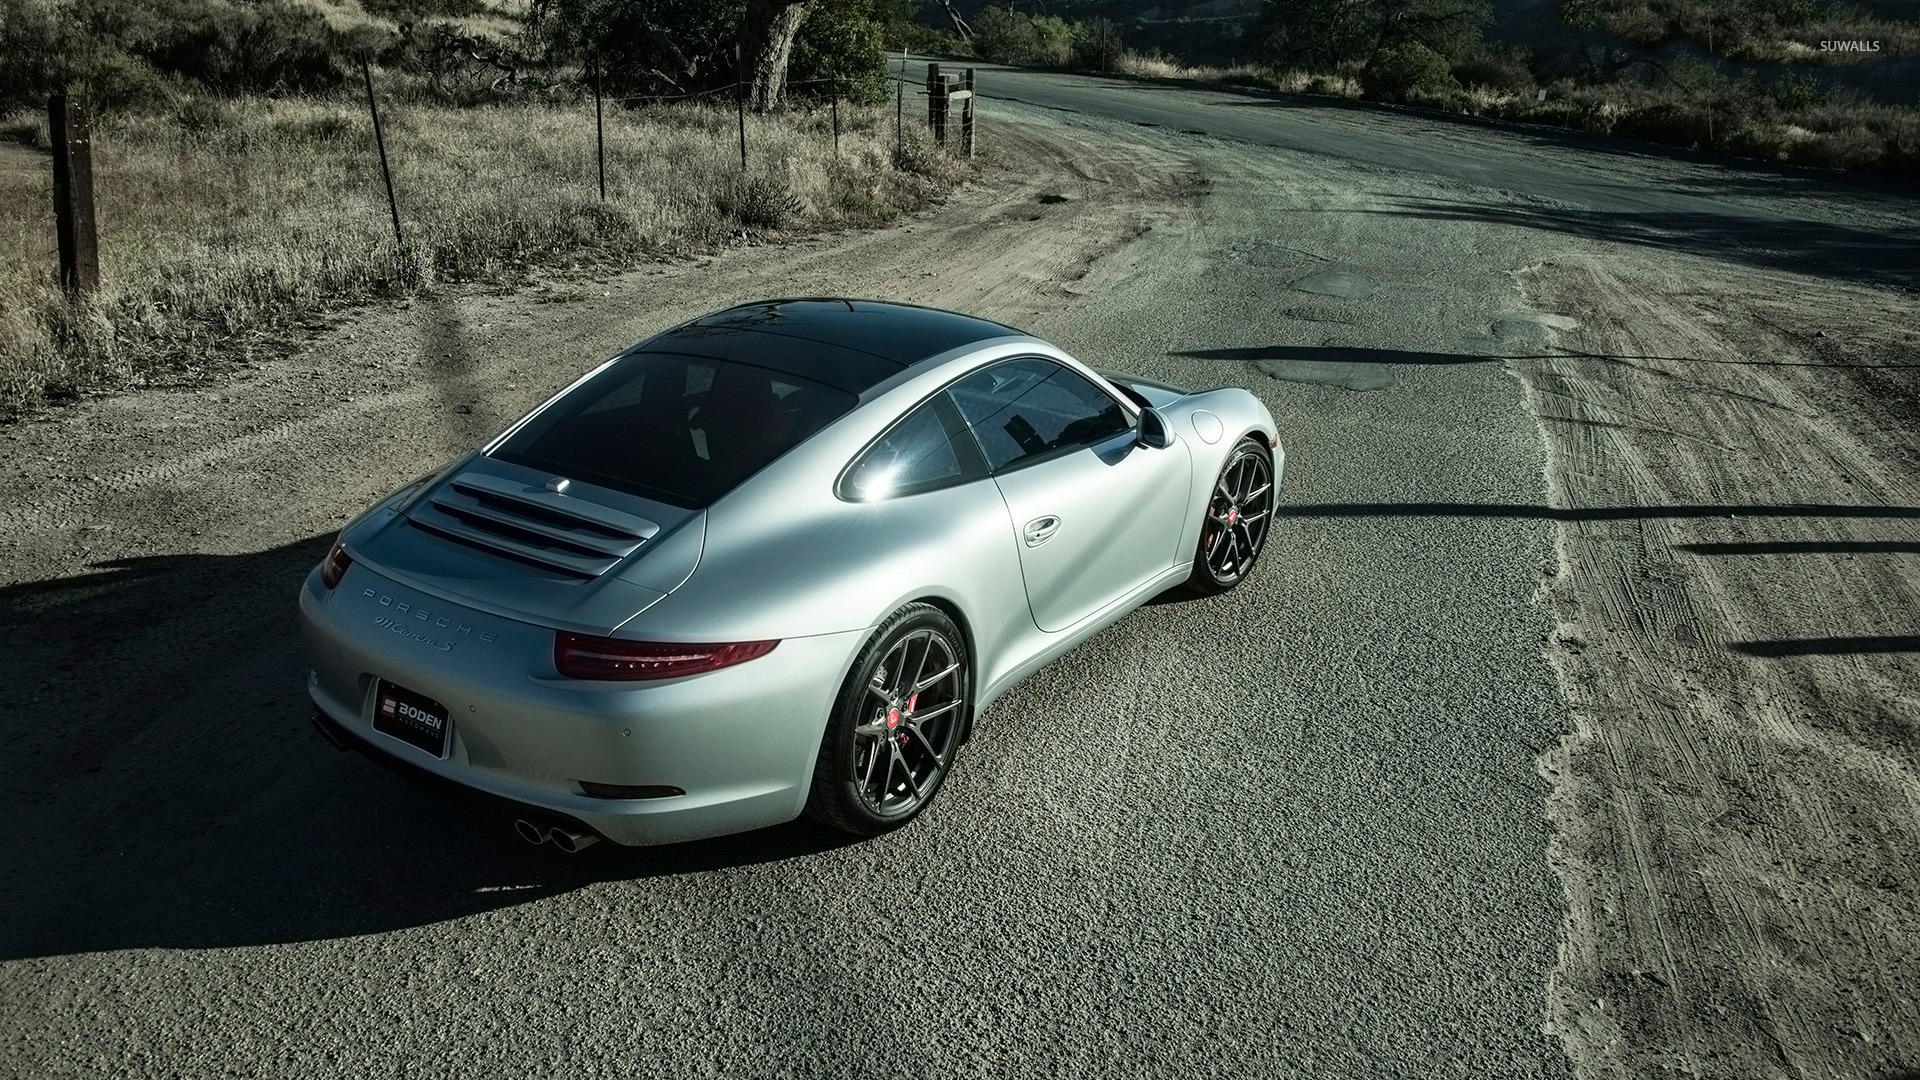 Boden porsche 911 carrera s back top view wallpaper car for Boden desktop